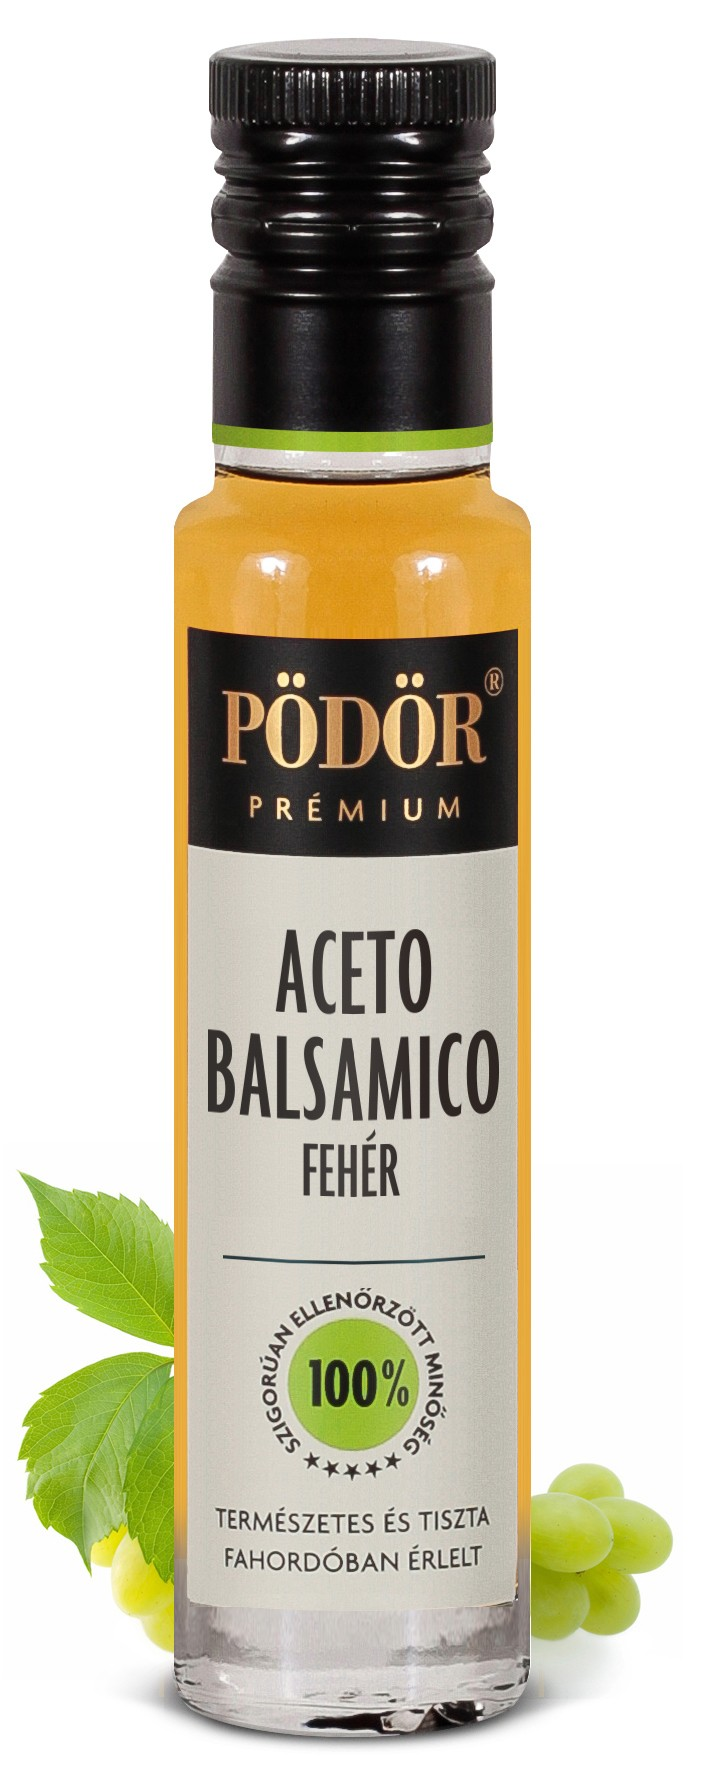 Aceto Balsamico Fehér